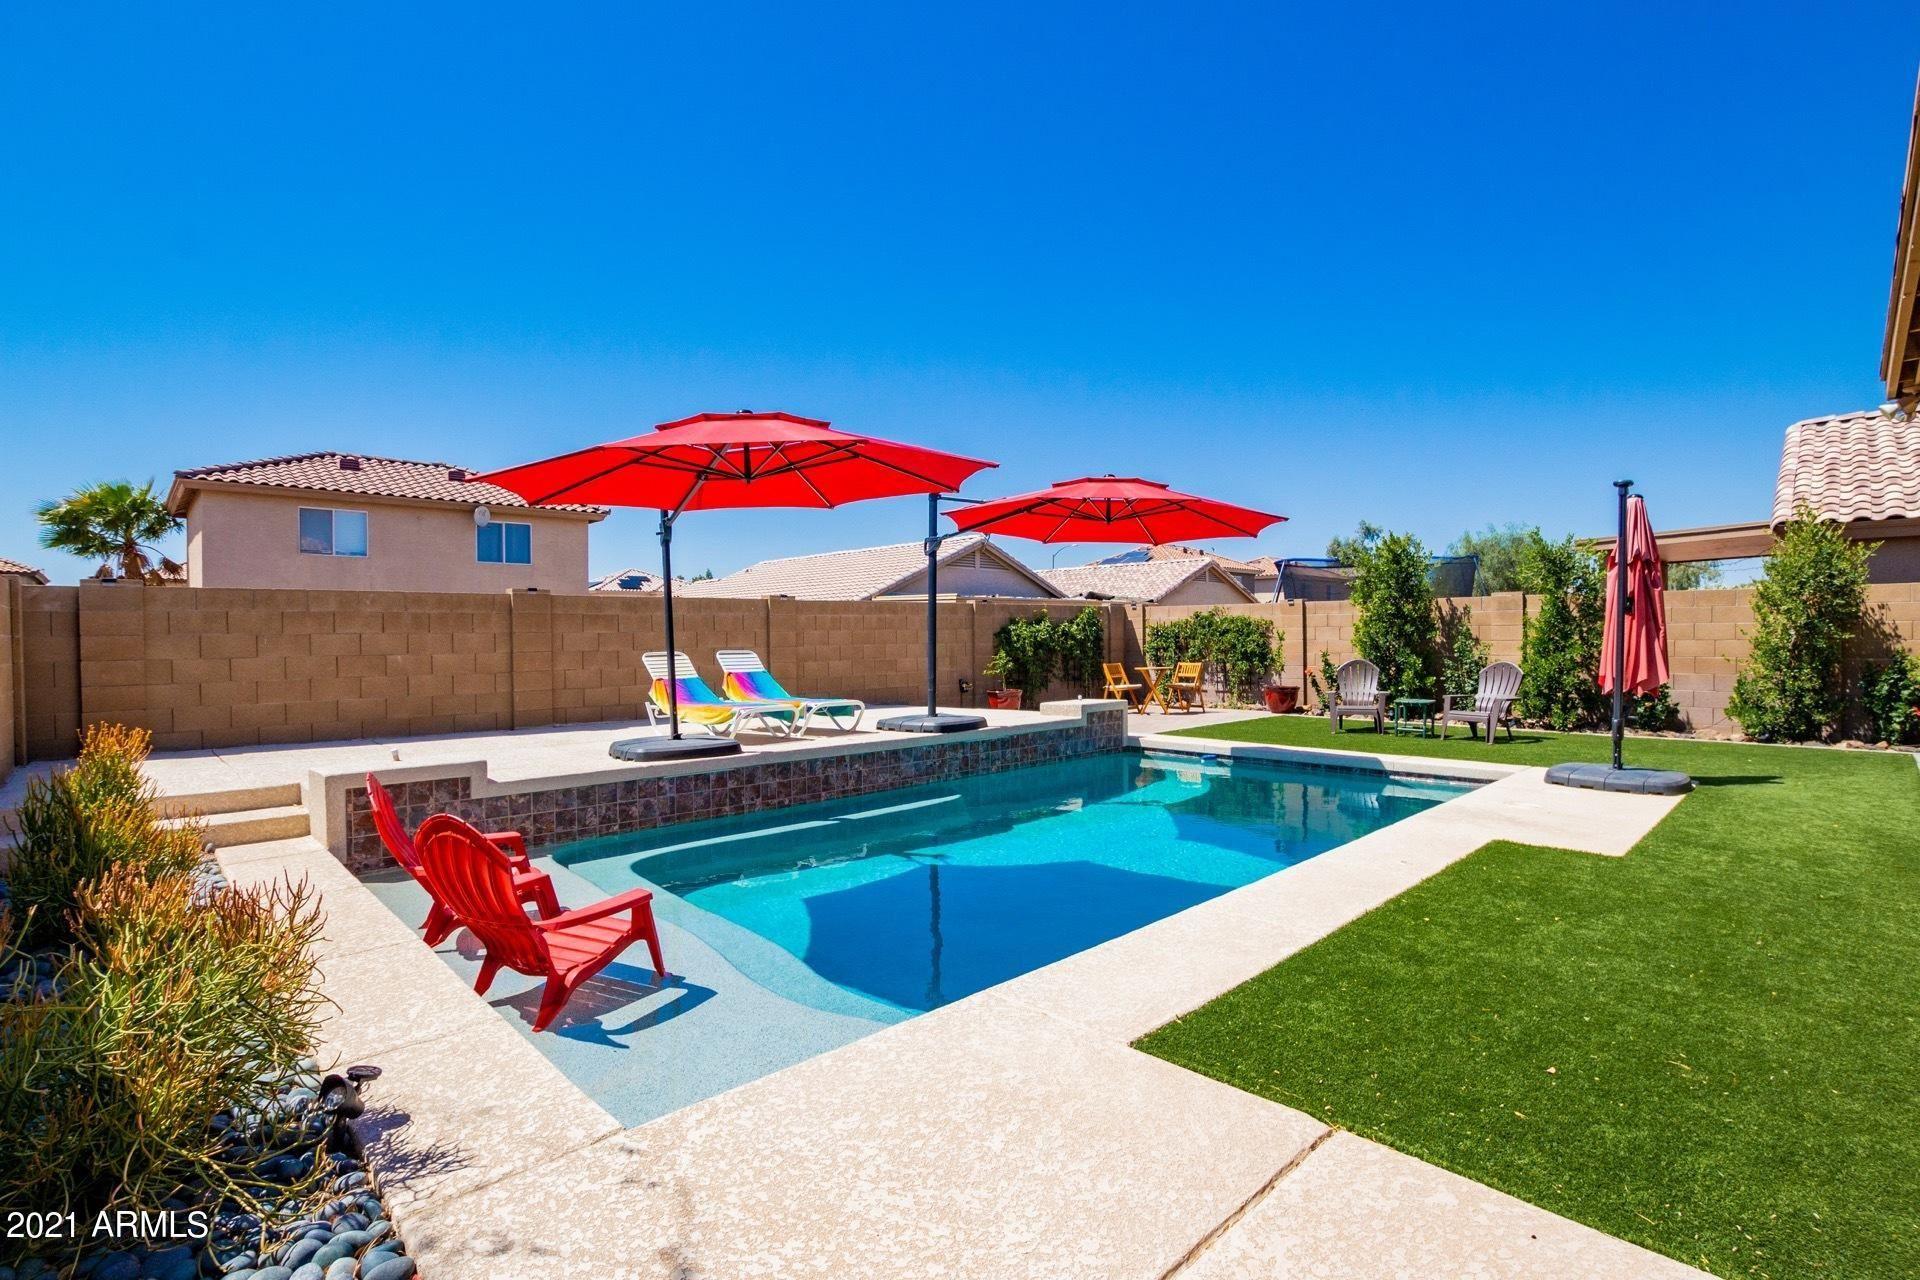 Photo of 11829 W CORTEZ Street, El Mirage, AZ 85335 (MLS # 6227256)